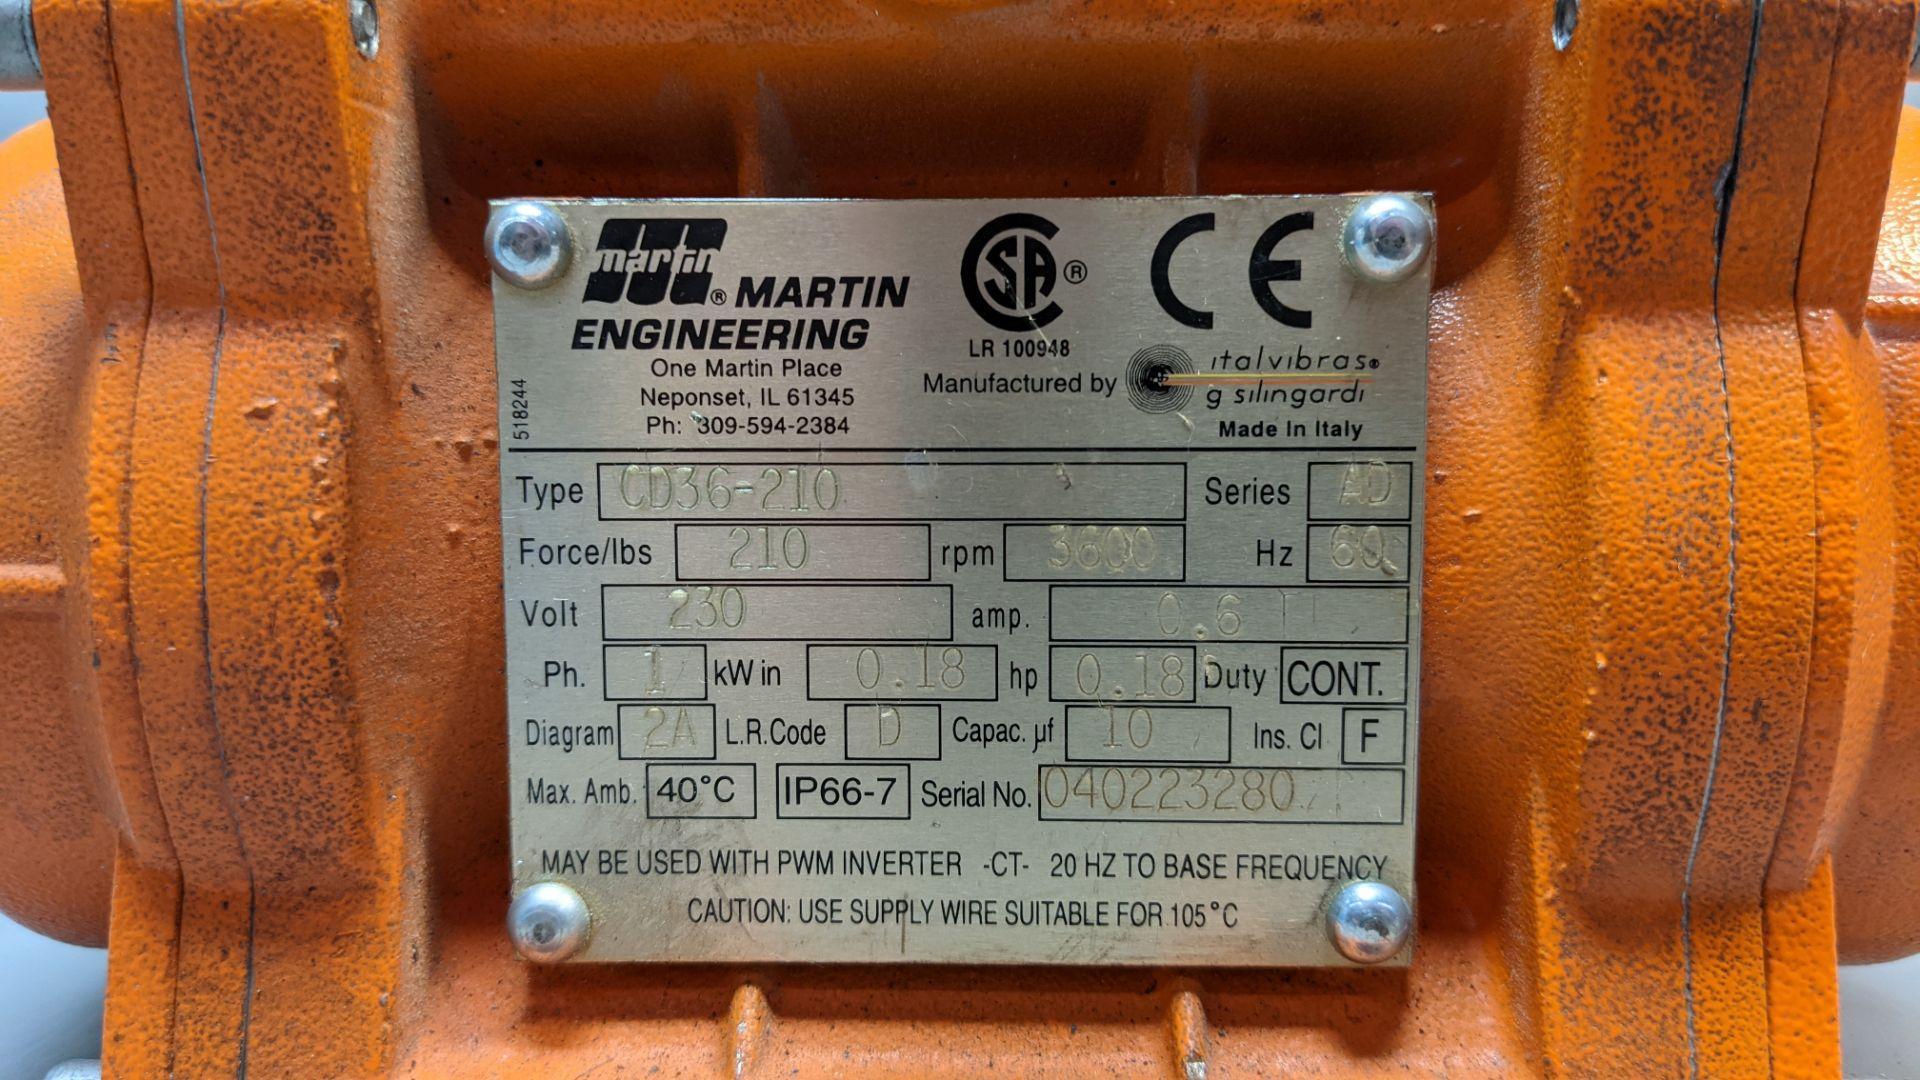 MARTIN ENGINEERING INDUSTRIAL VIBRATOR - Image 2 of 3